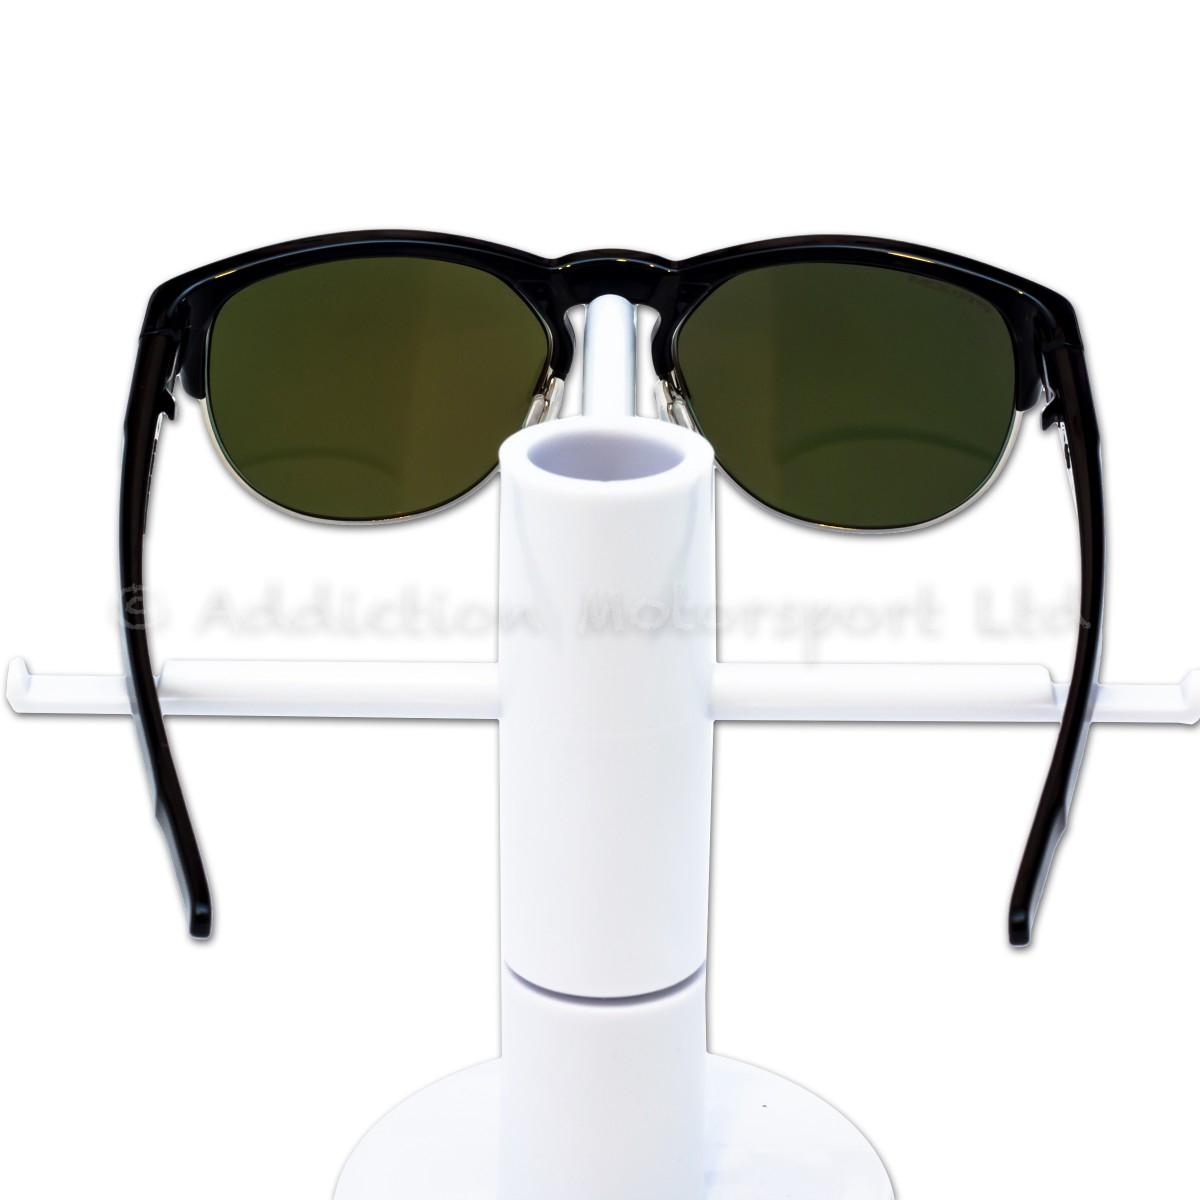 8c230c4b01c4c OAKLEY Latch Key Sunglasses - Addiction Motorsport Ltd